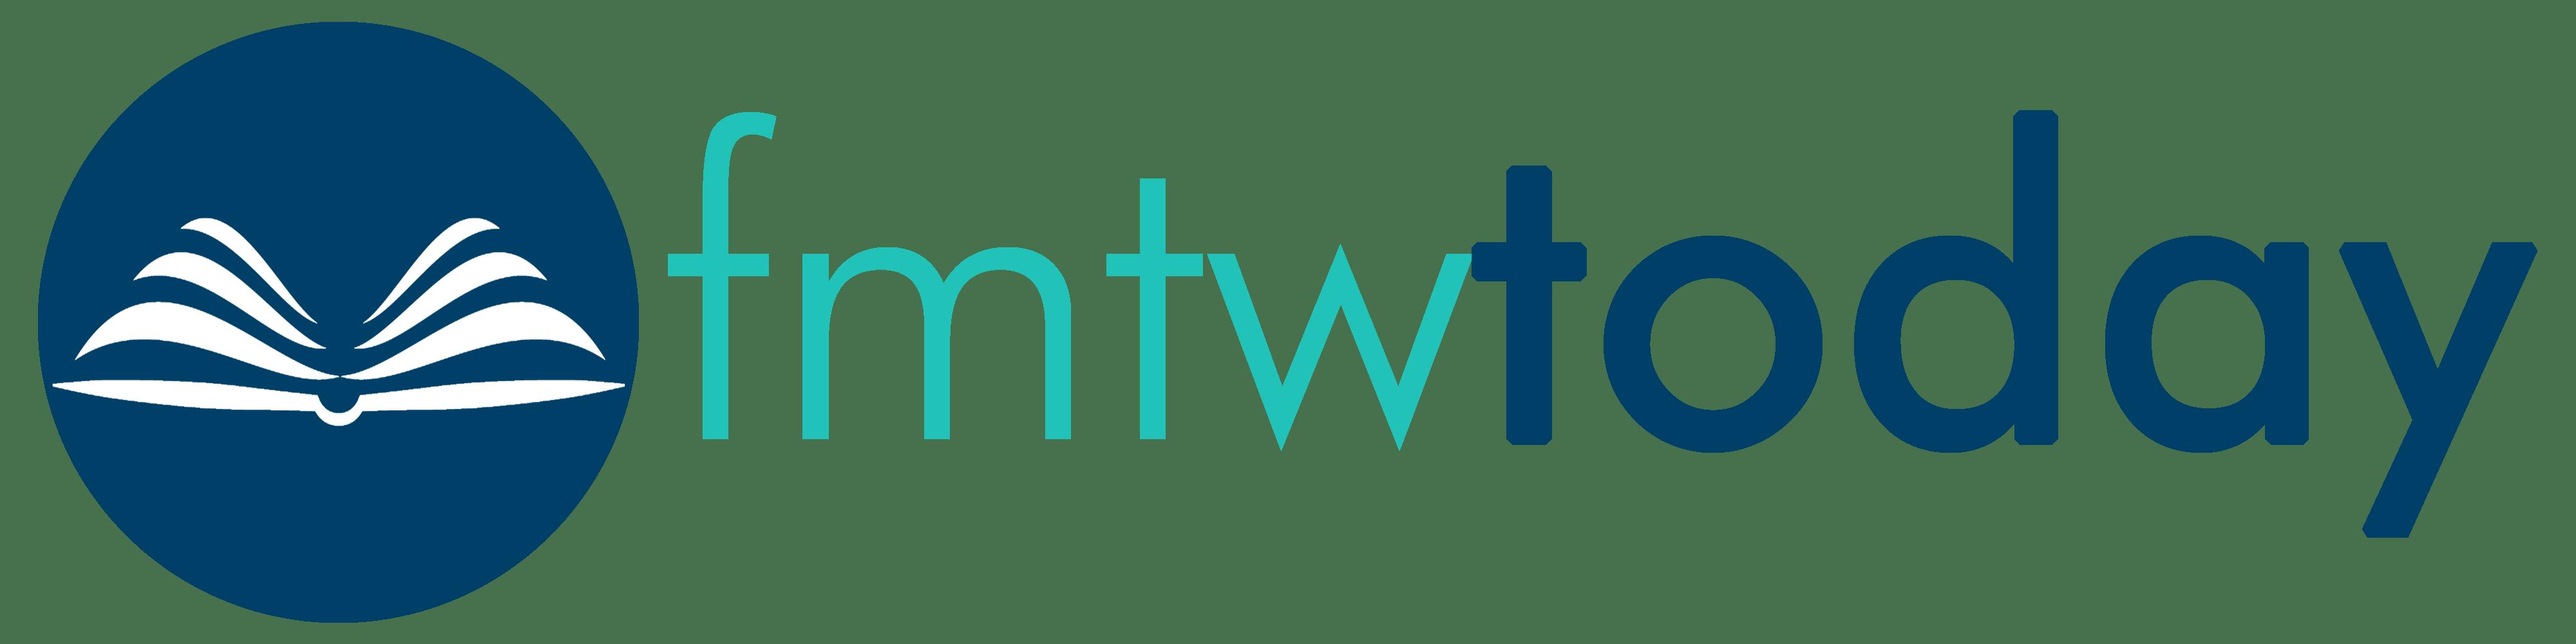 FMTWT Website Logo New